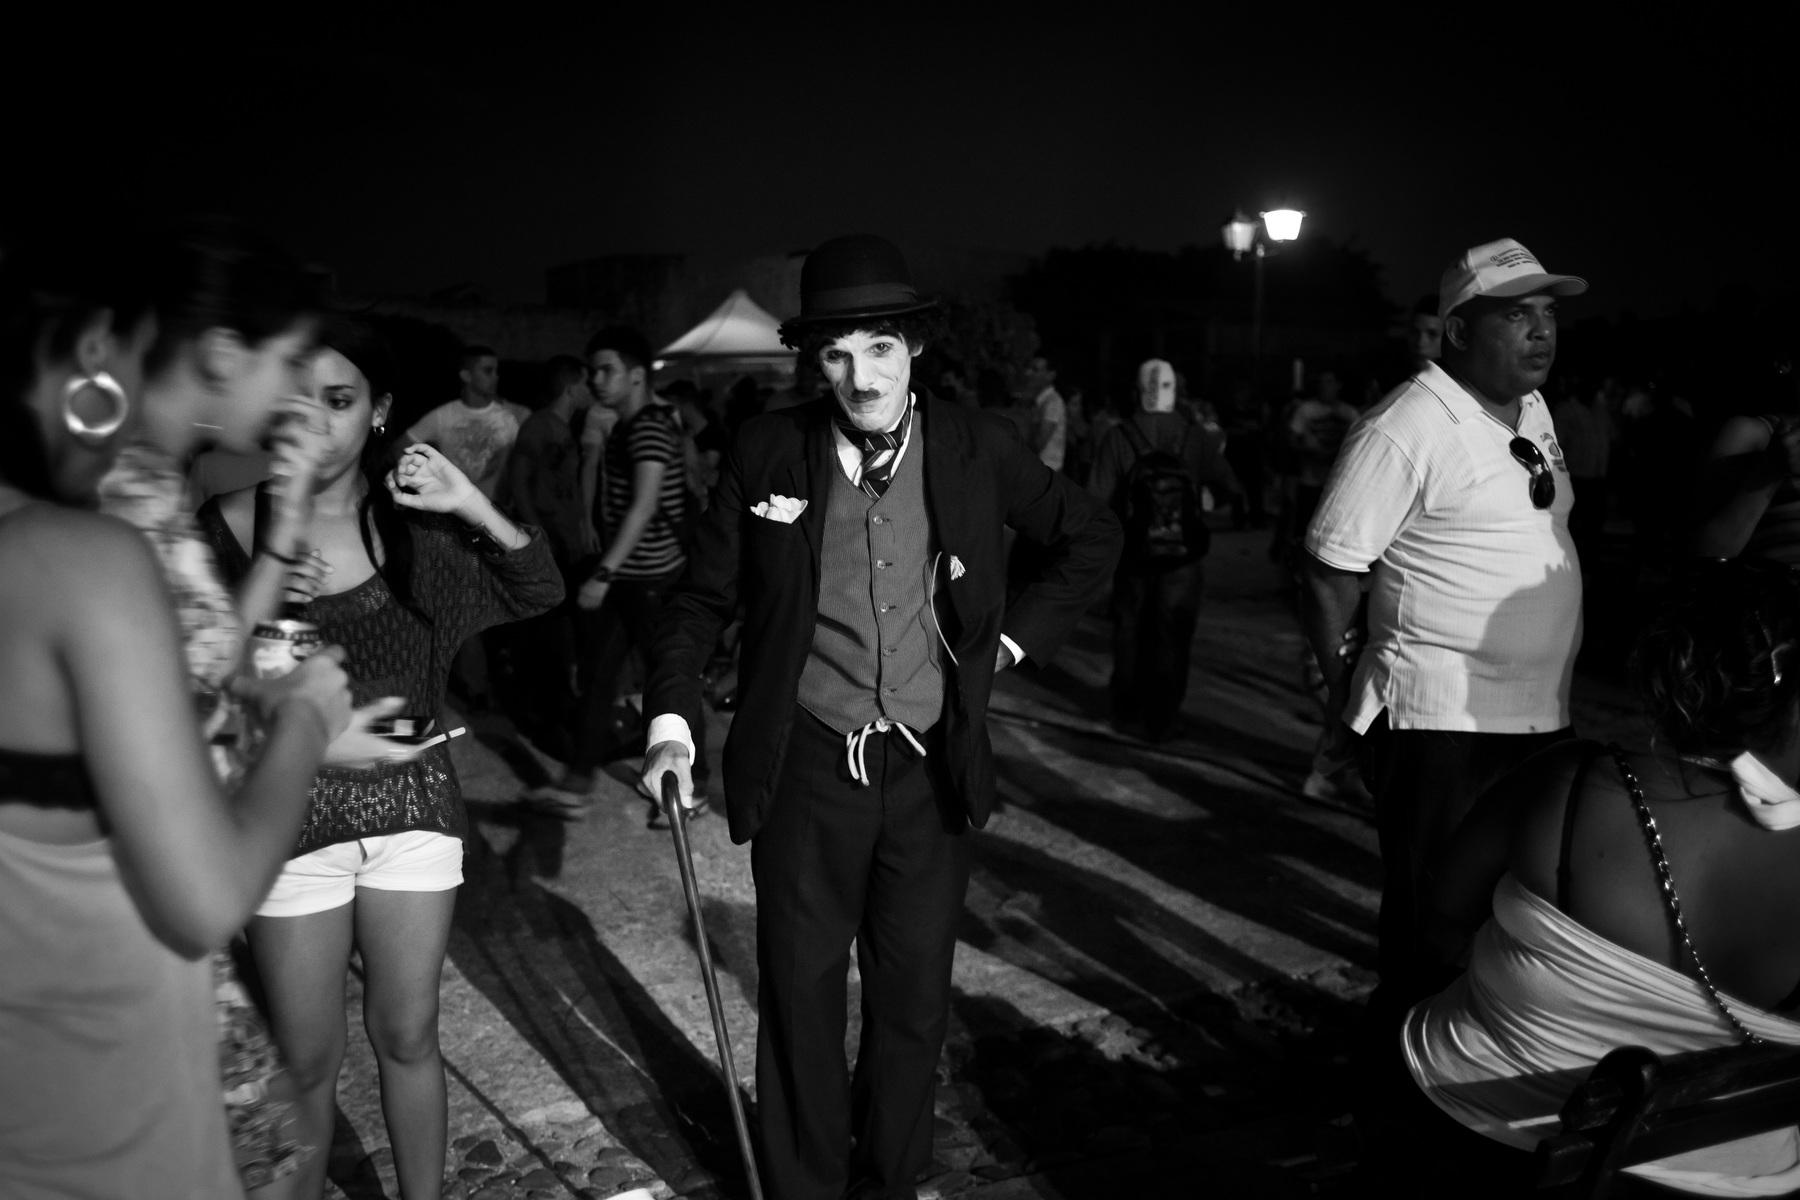 Cuba_2014_Poole003.JPG